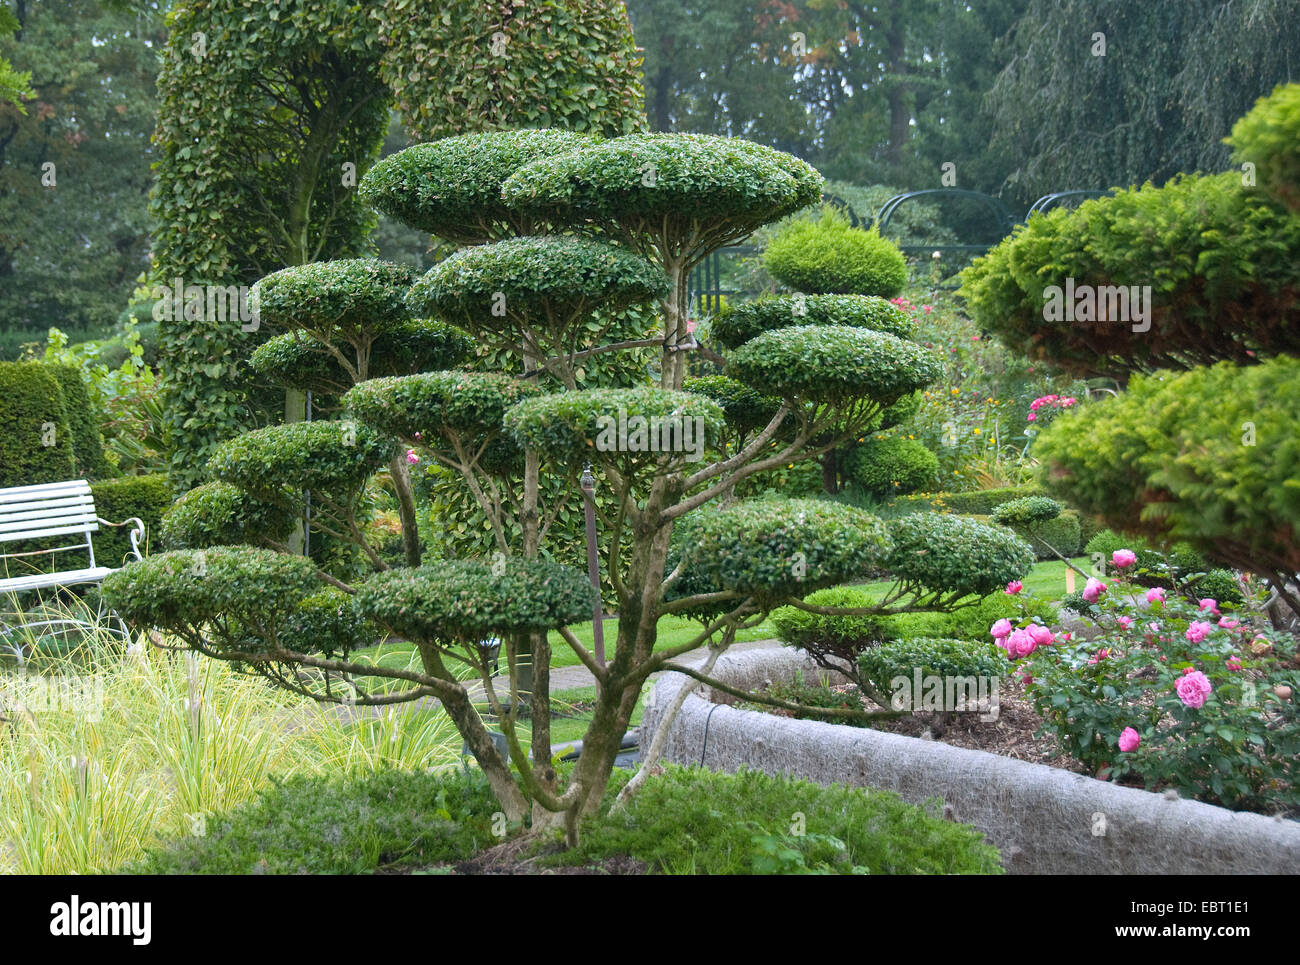 japanese holly ilex crenata garden bonsai stock photo. Black Bedroom Furniture Sets. Home Design Ideas